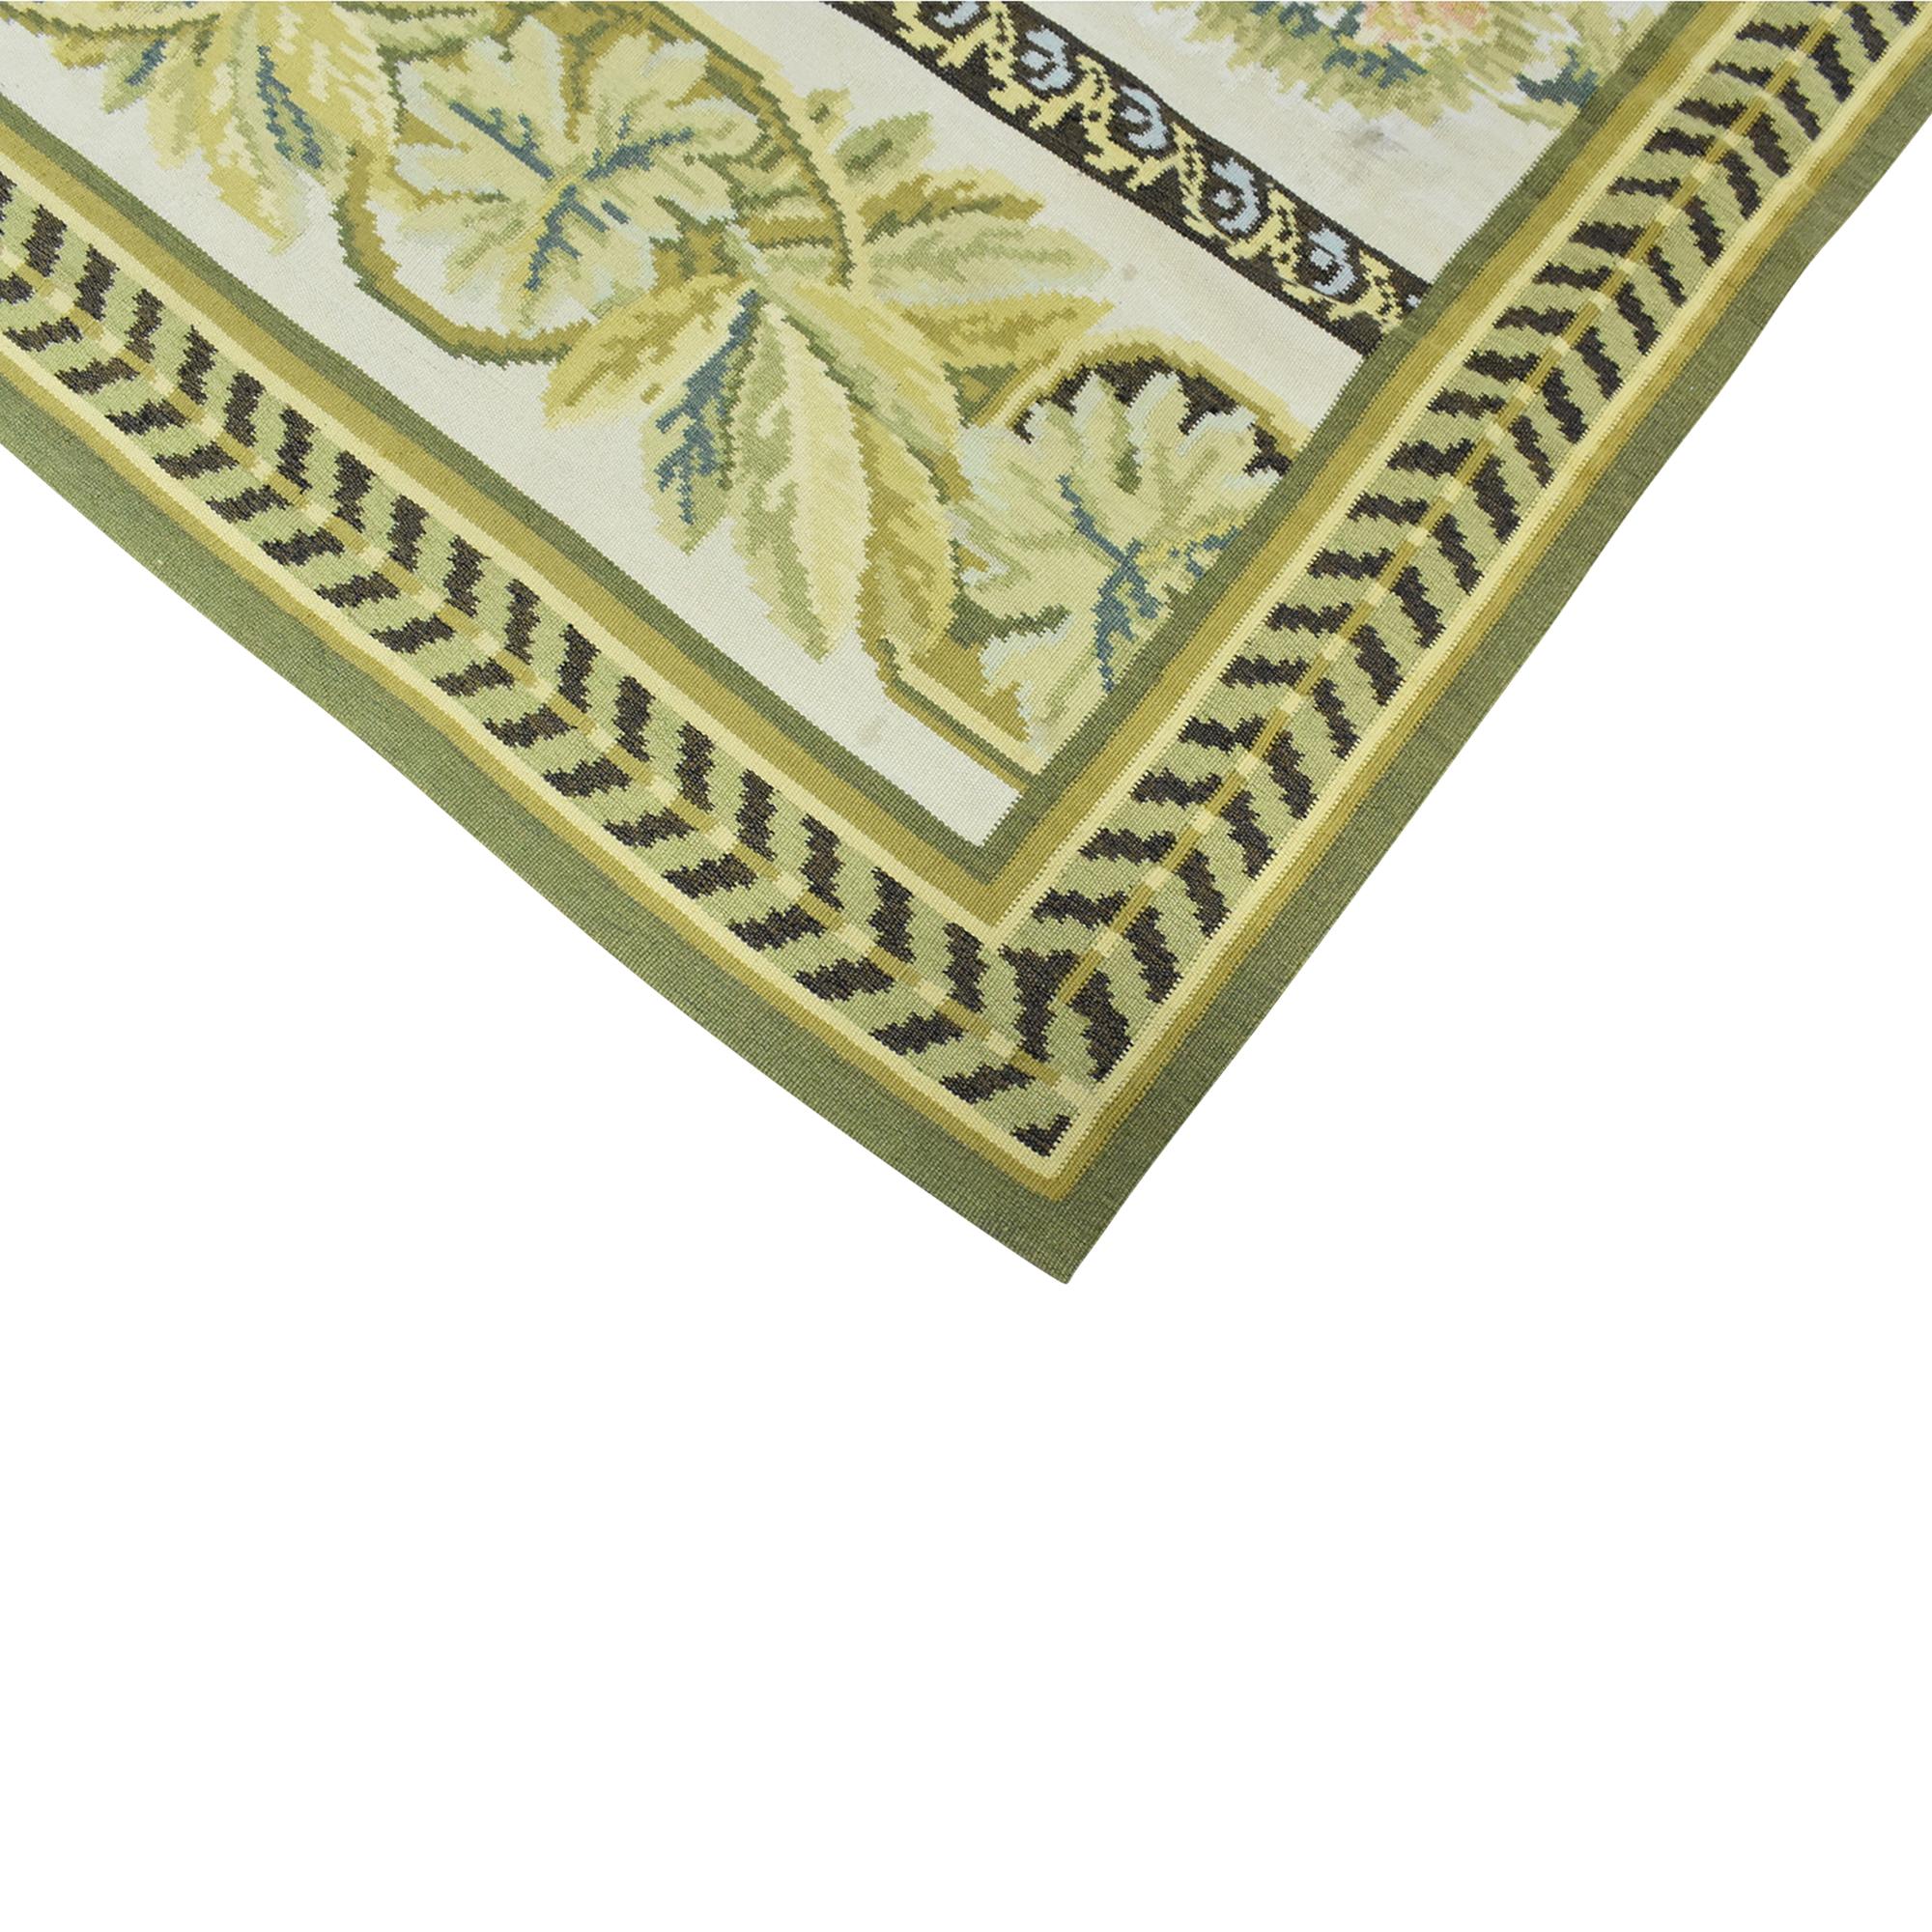 Stark Carpet Stark Carpet Patterned Area Rug pa